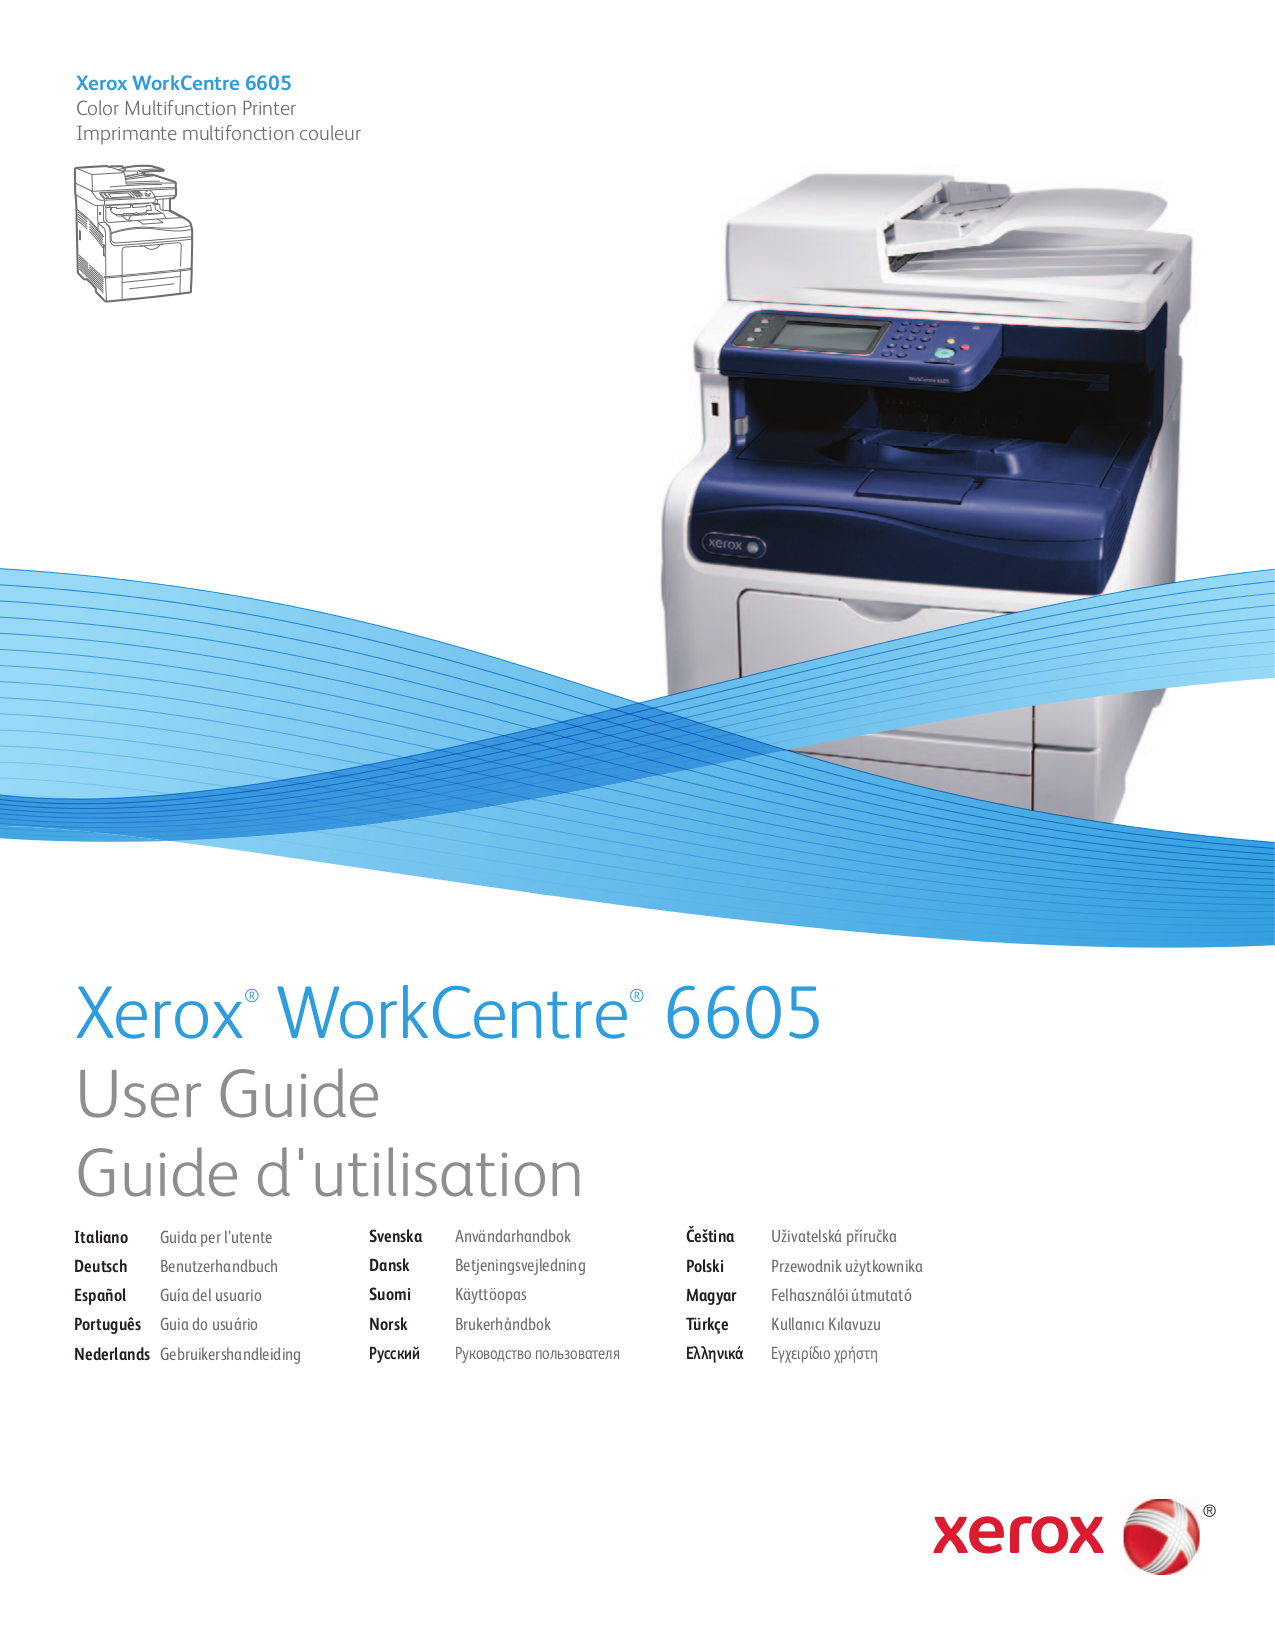 workcentre 5300 user guide ebook